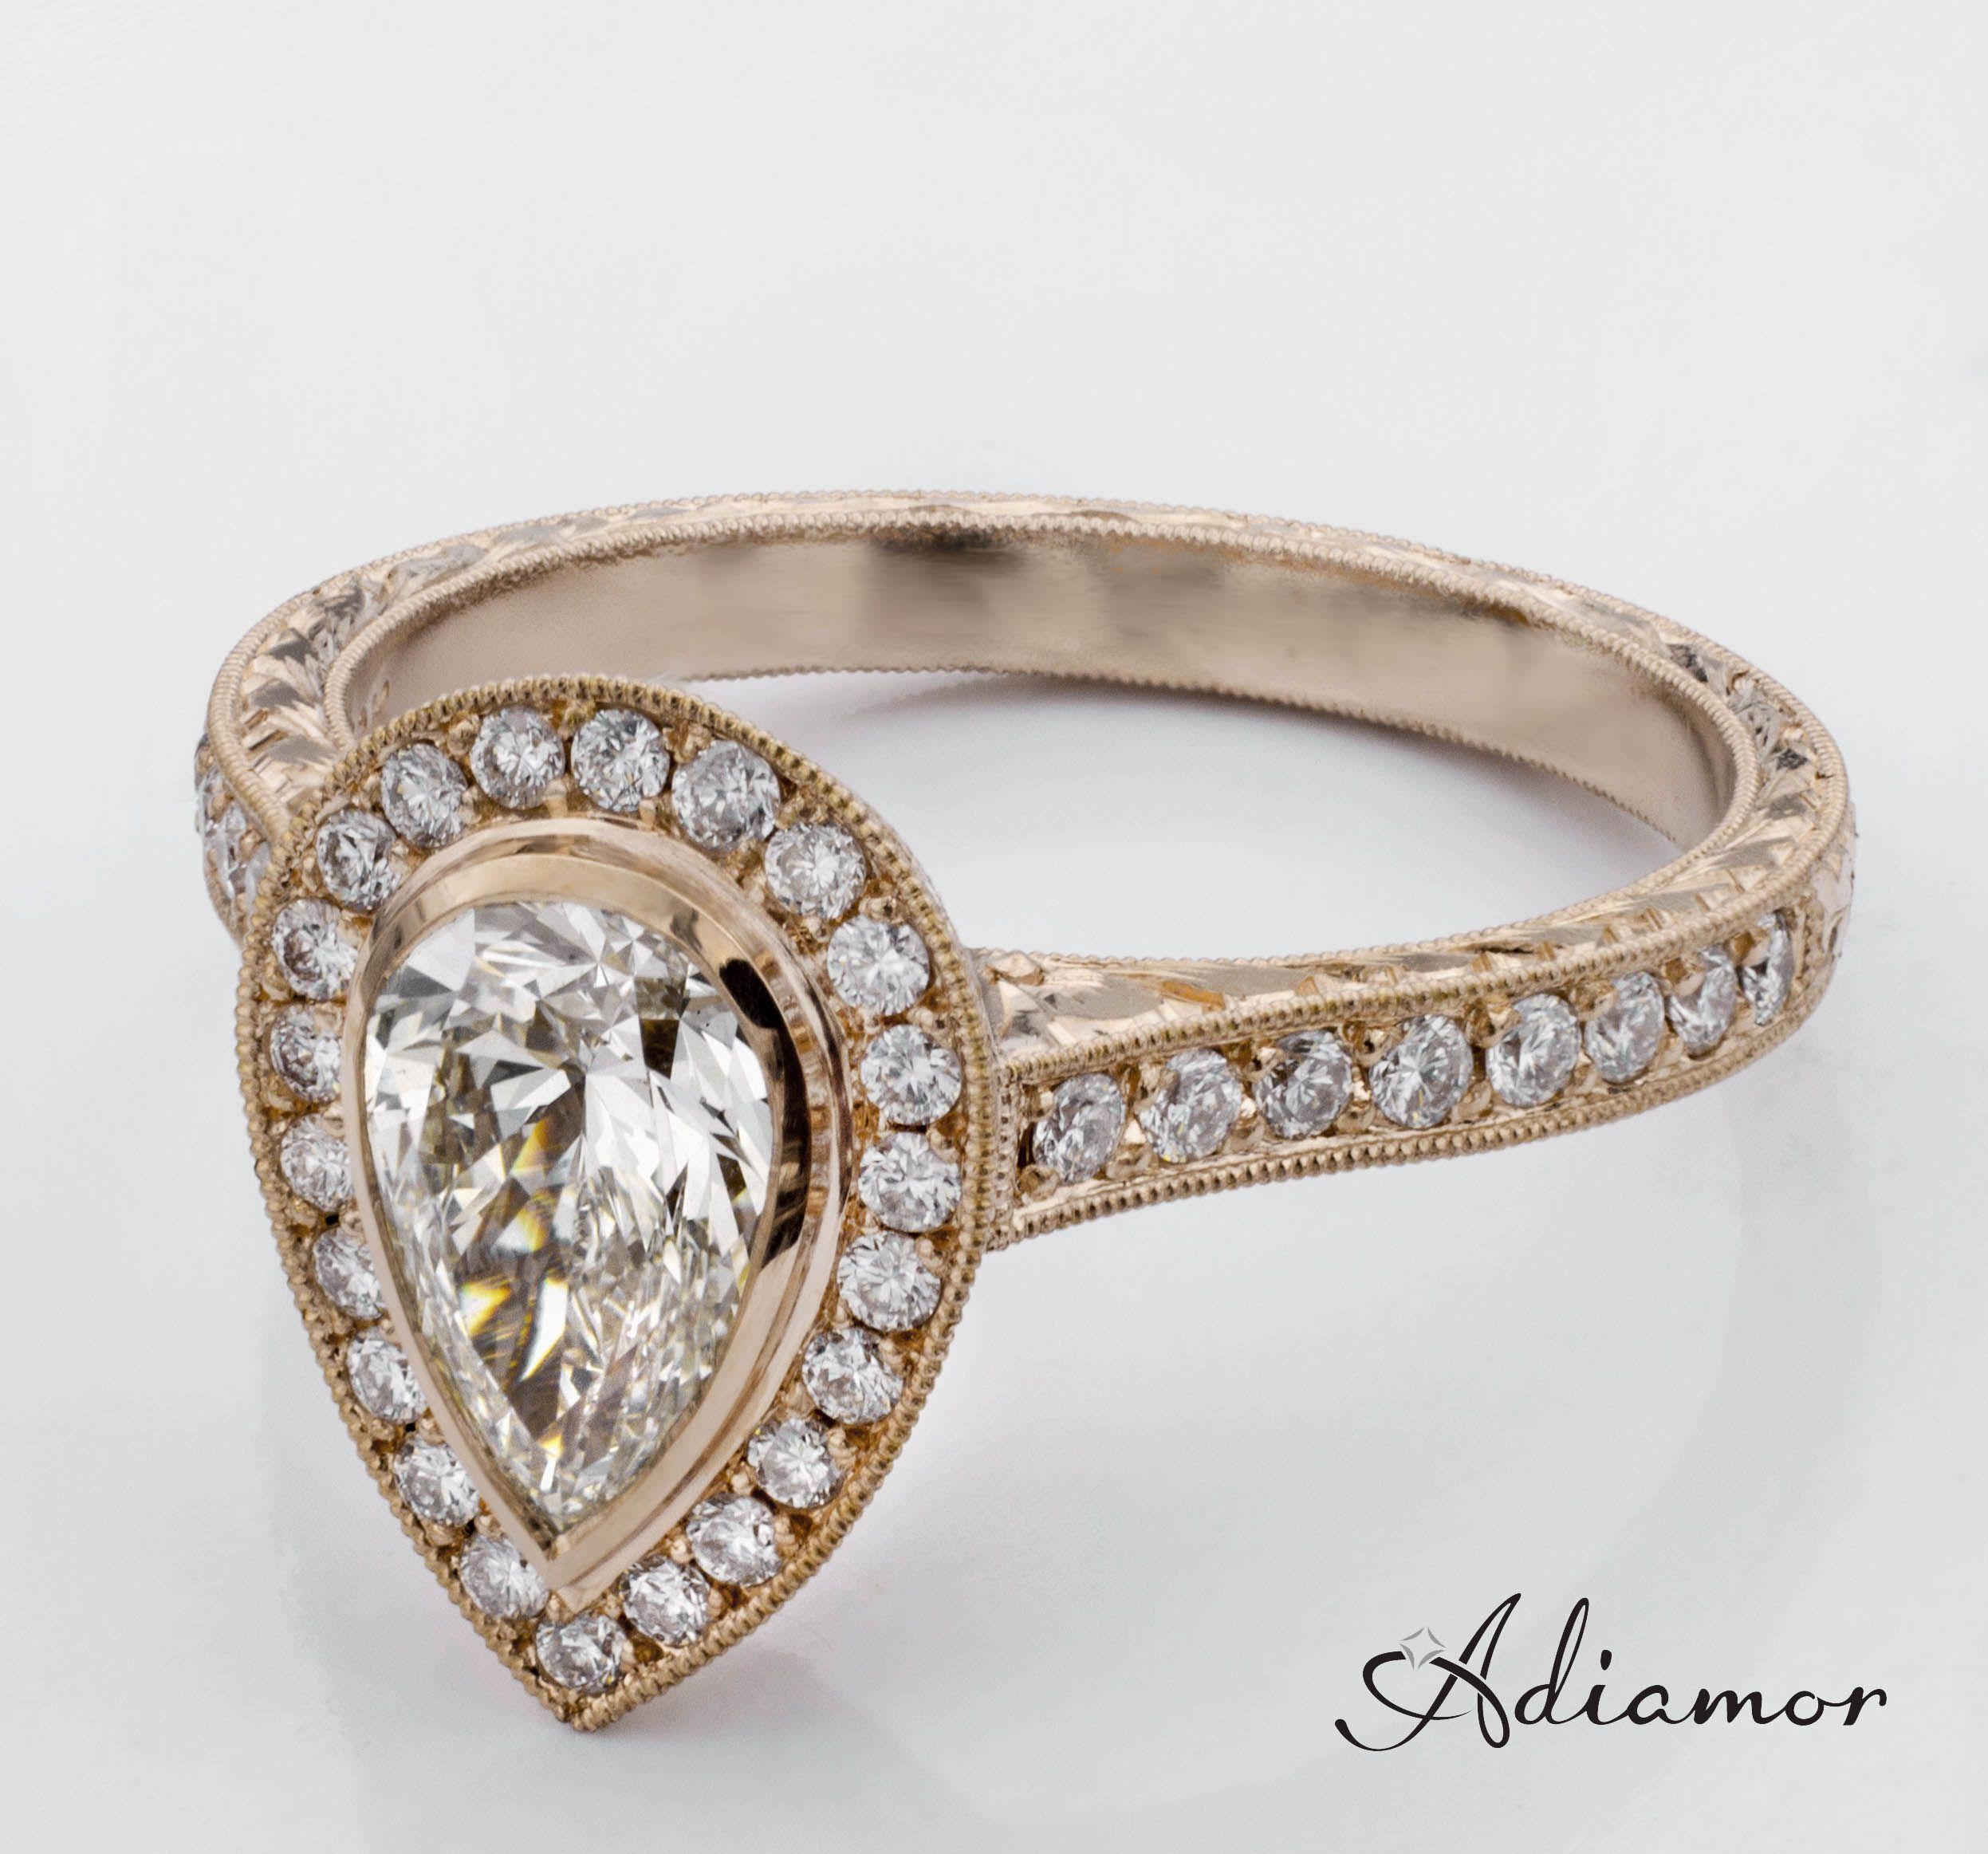 Halo rose gold diamond engagement ring bezel - Custom Pear Halo Diamond Engagement Ring In Rose Gold From Adiamor